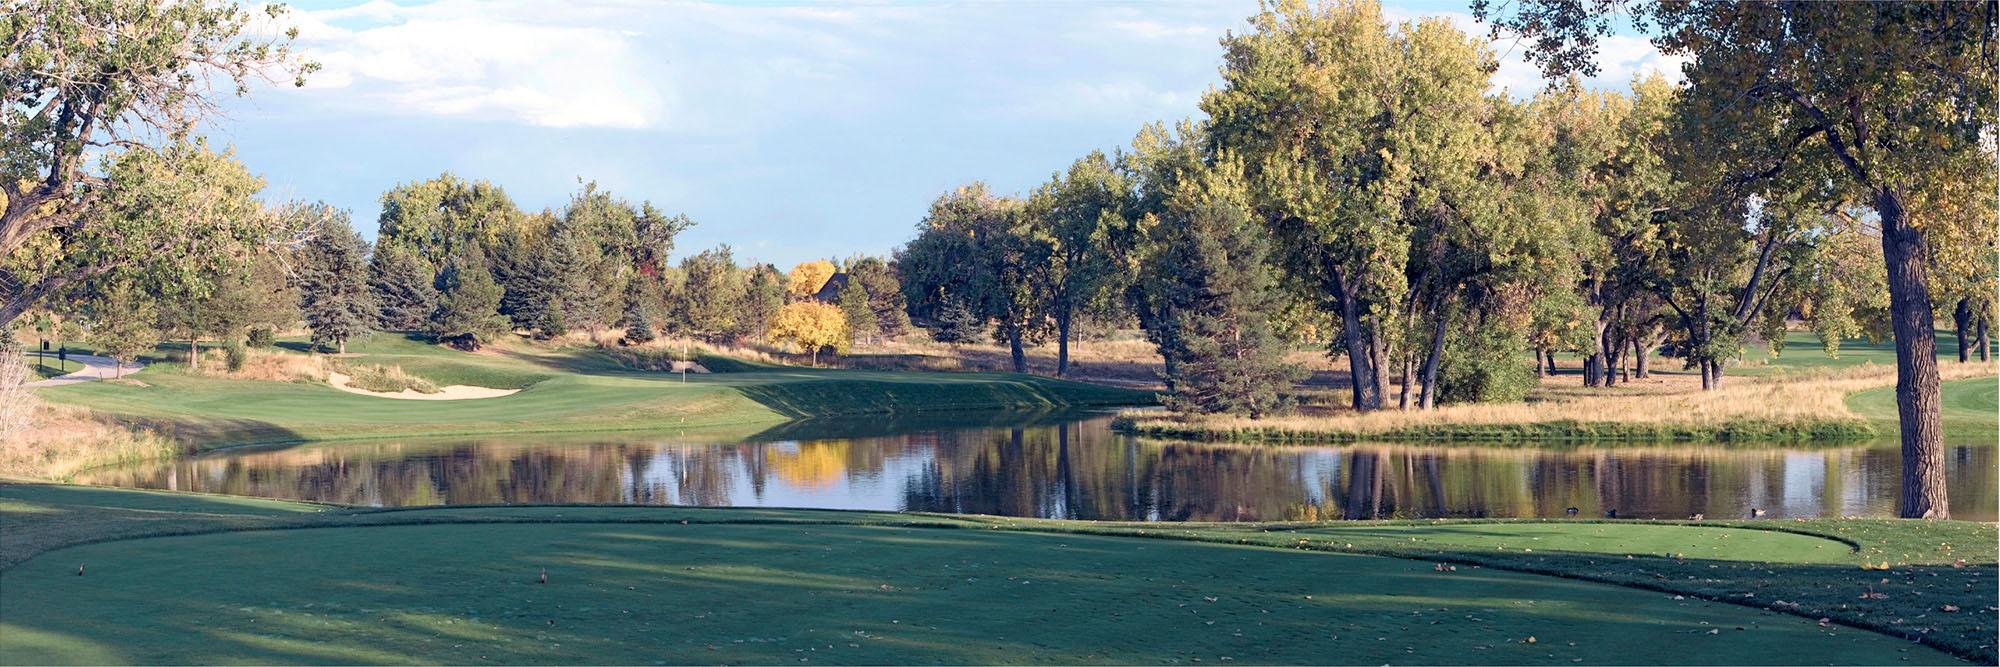 Golf Course Image - Cherry Creek No. 7